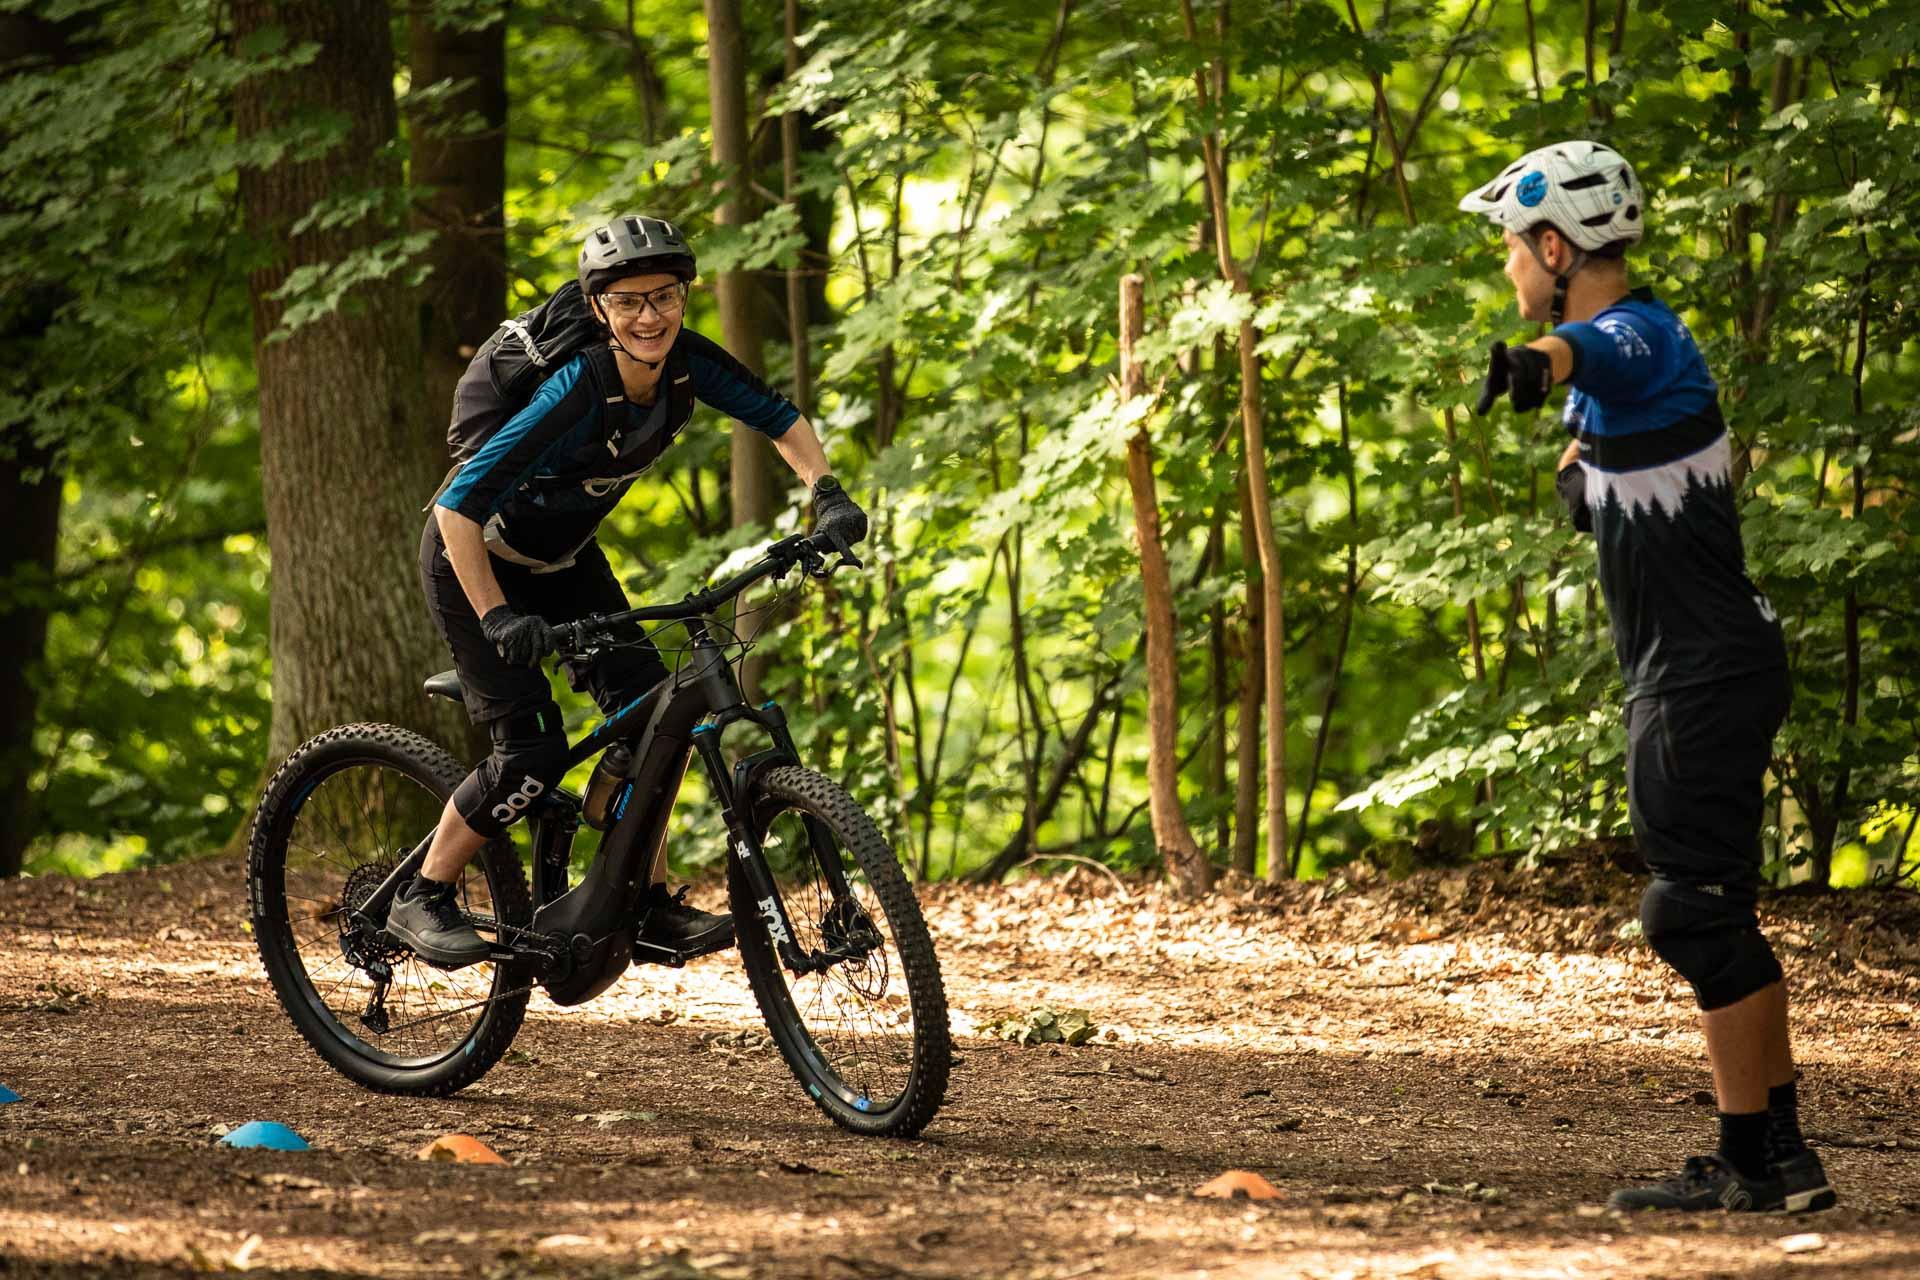 eBike eMTB eMountainbike Fahrtechnik Kurs Basic Training Rock my Trail Bikeschule 21 1 - Rock my Trail Bikeschule